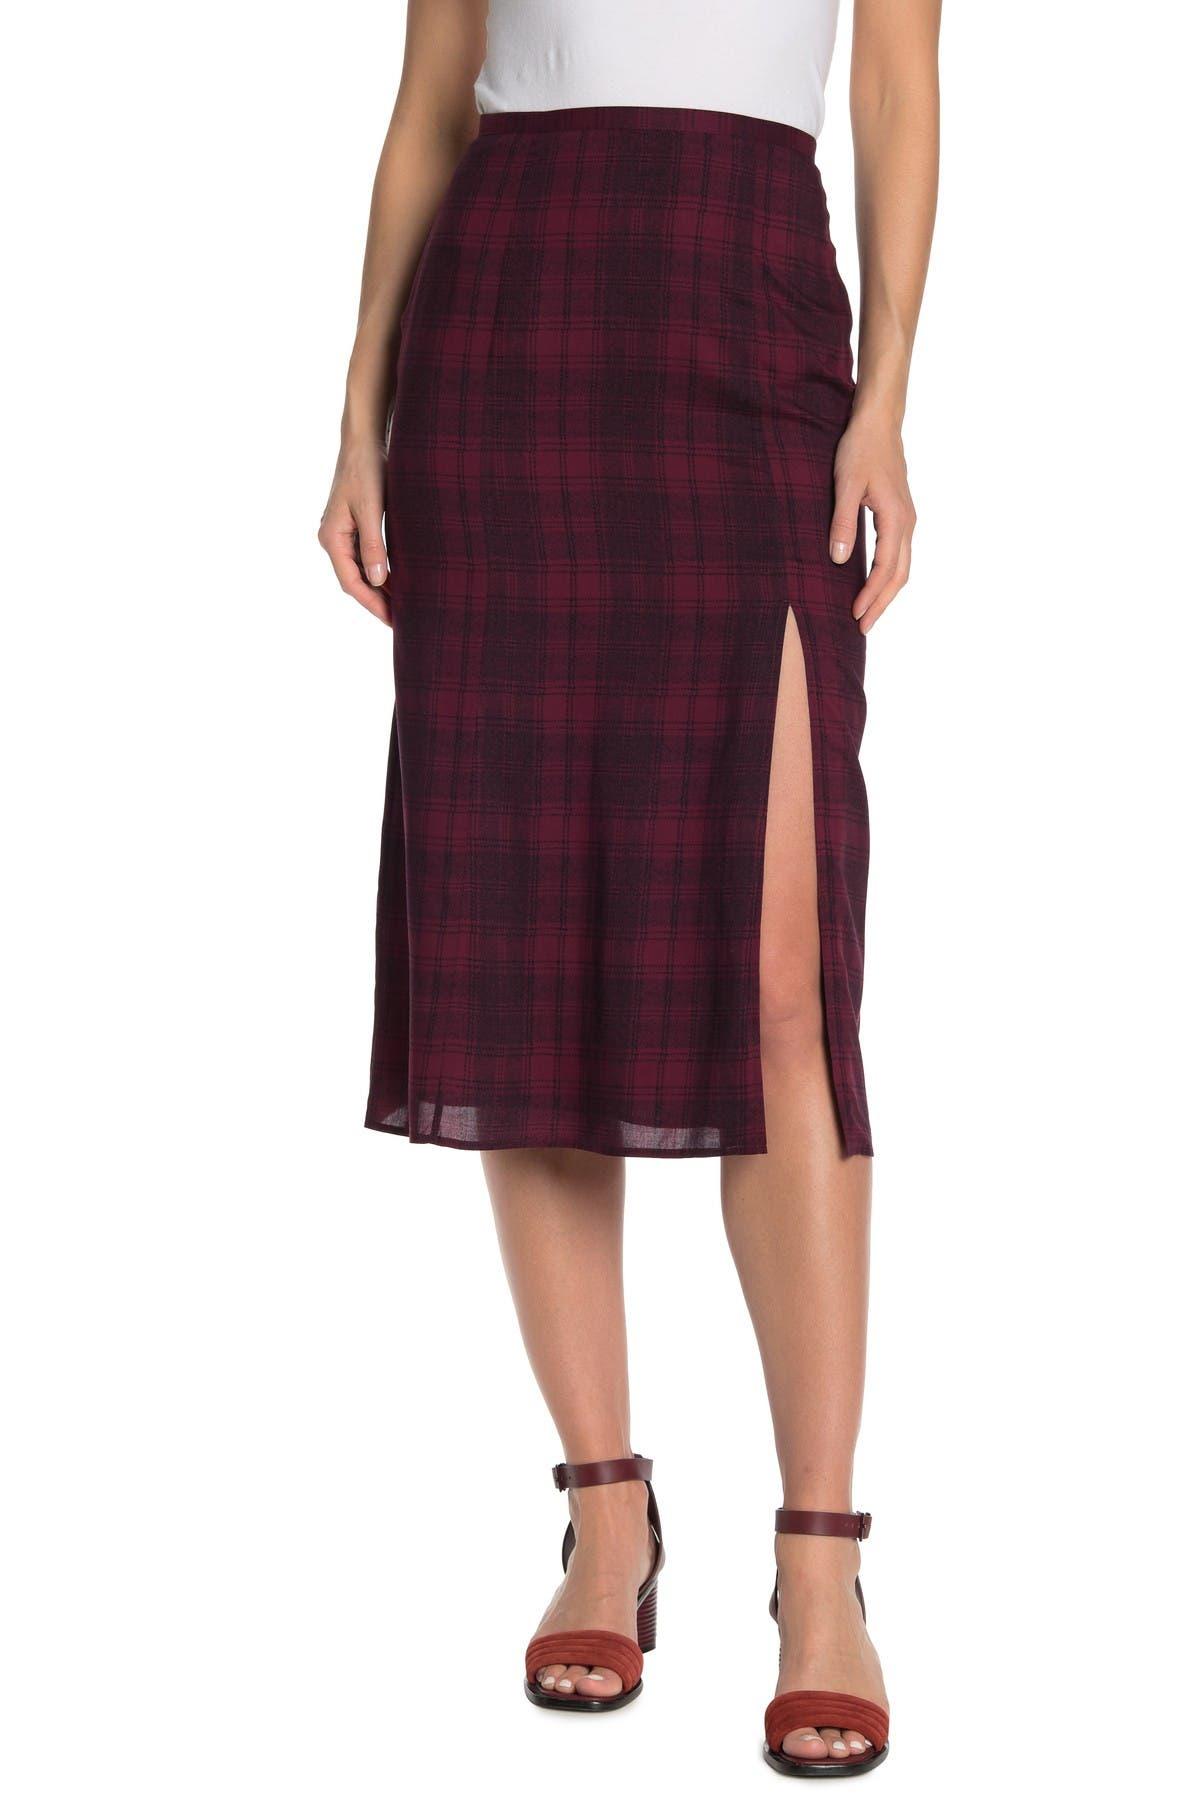 Image of PAIGE Delfina Midi Skirt